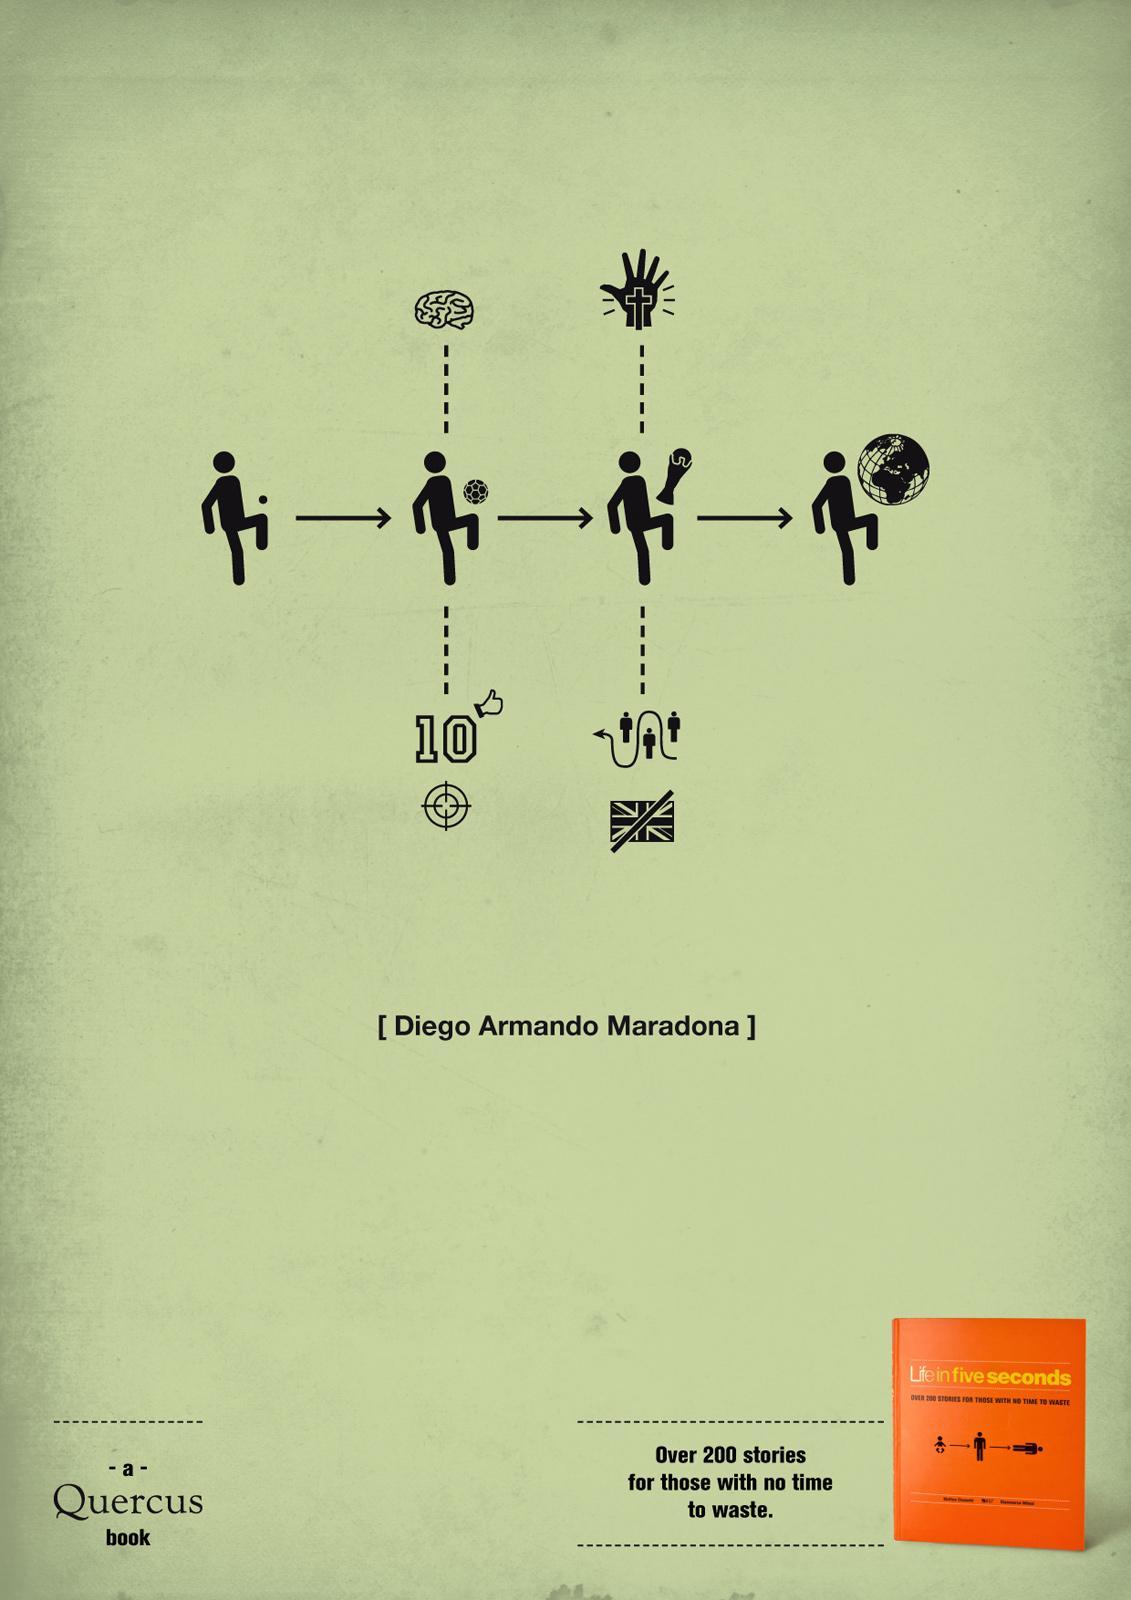 Quercus Books Print Ad -  Life in five seconds, Maradona